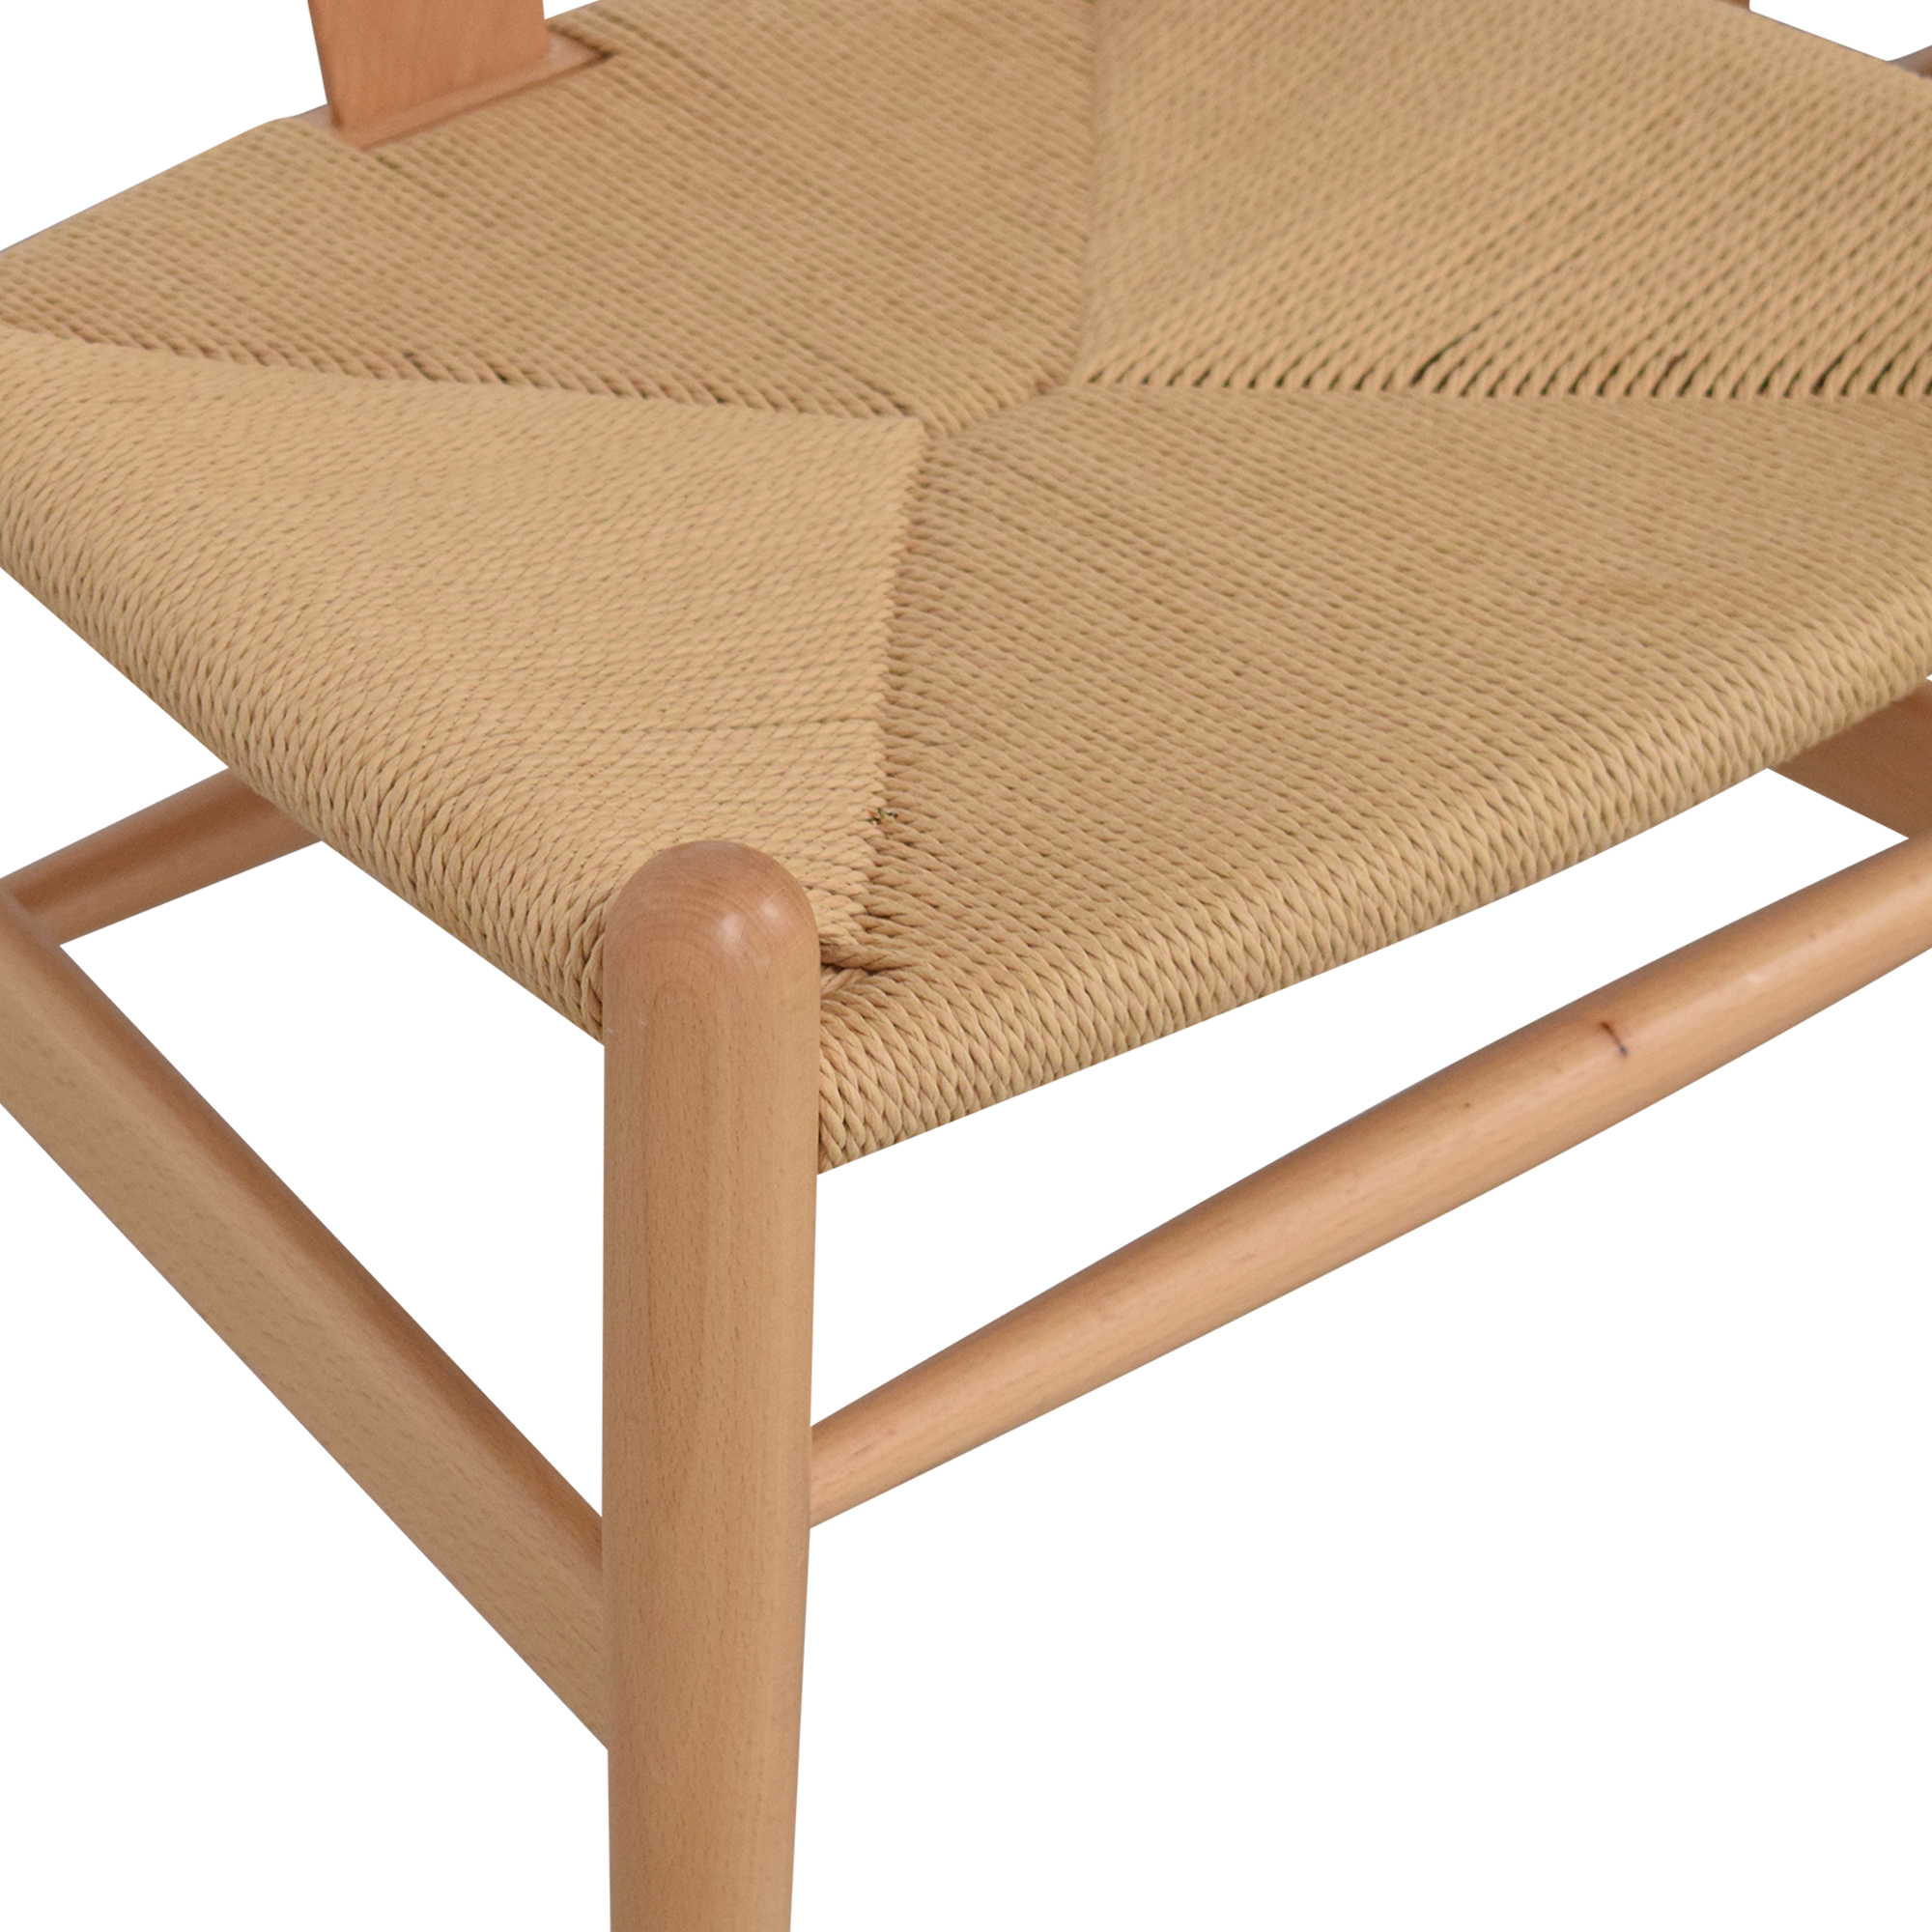 Baxton Studio Baxton Studio Wishbone Modern Brown Wood Dining Chairs for sale